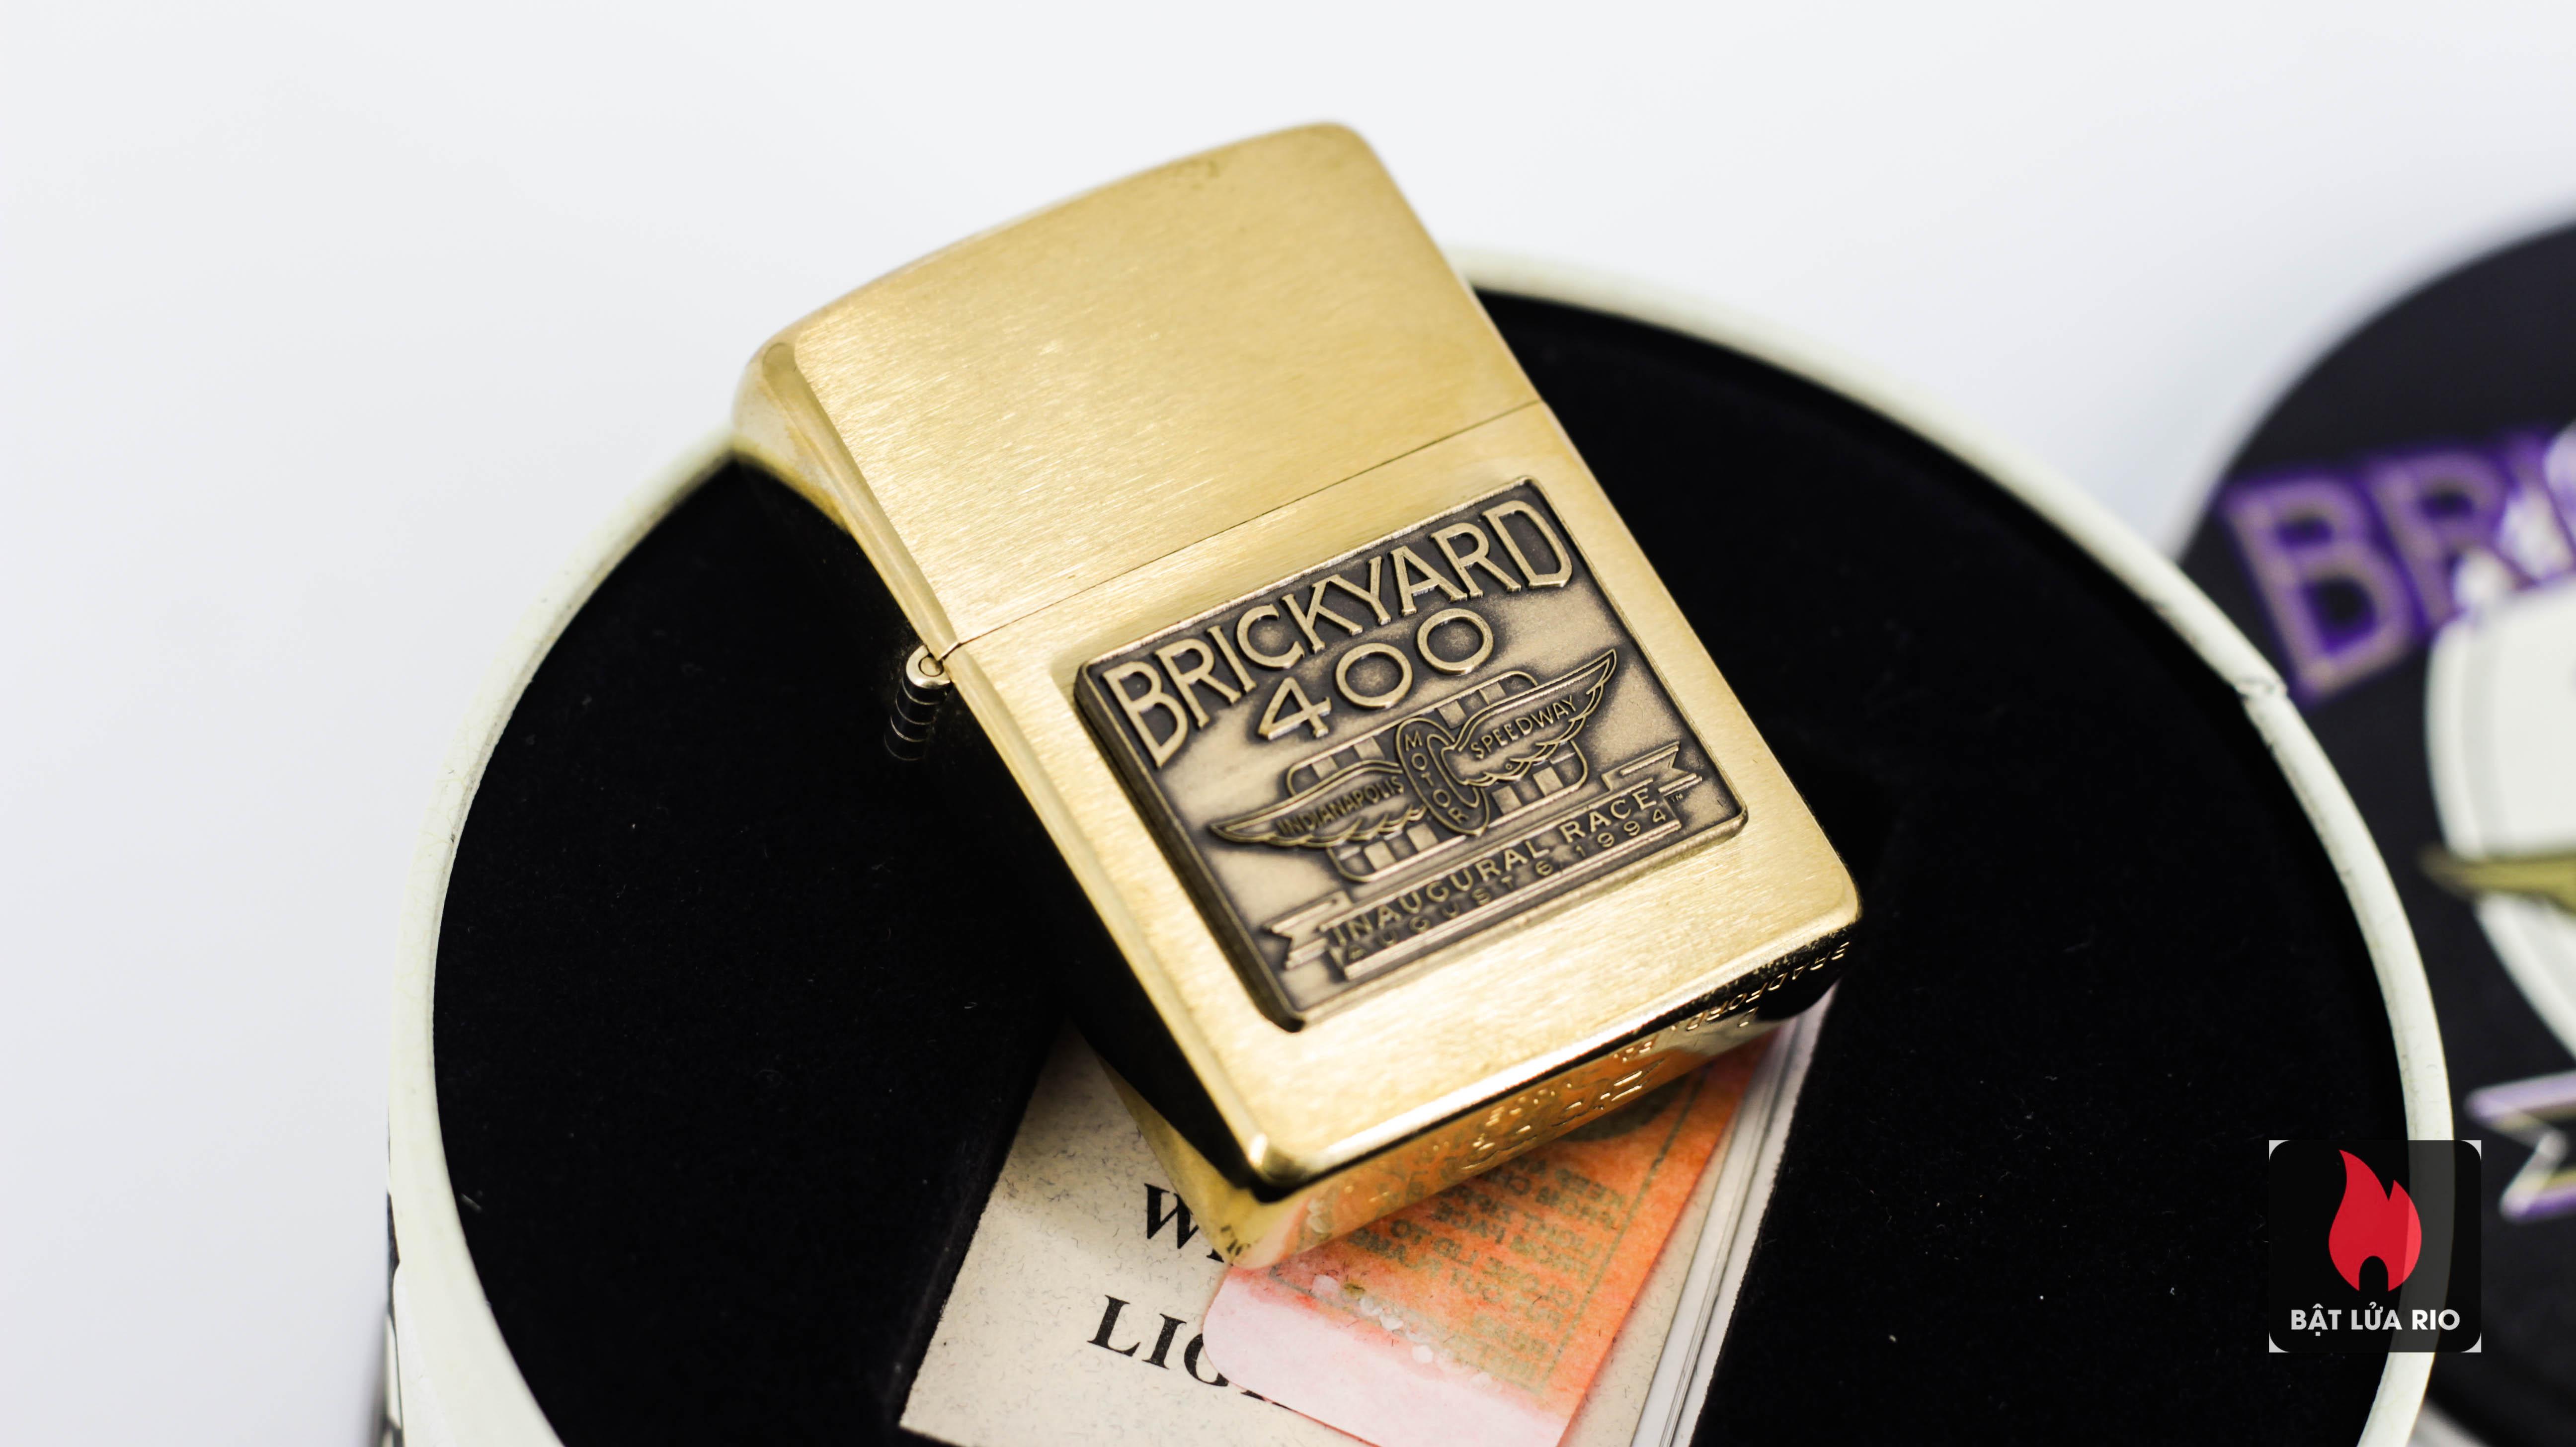 Zippo La Mã 1994 - Brickyard 400 - Brushed Brass 2